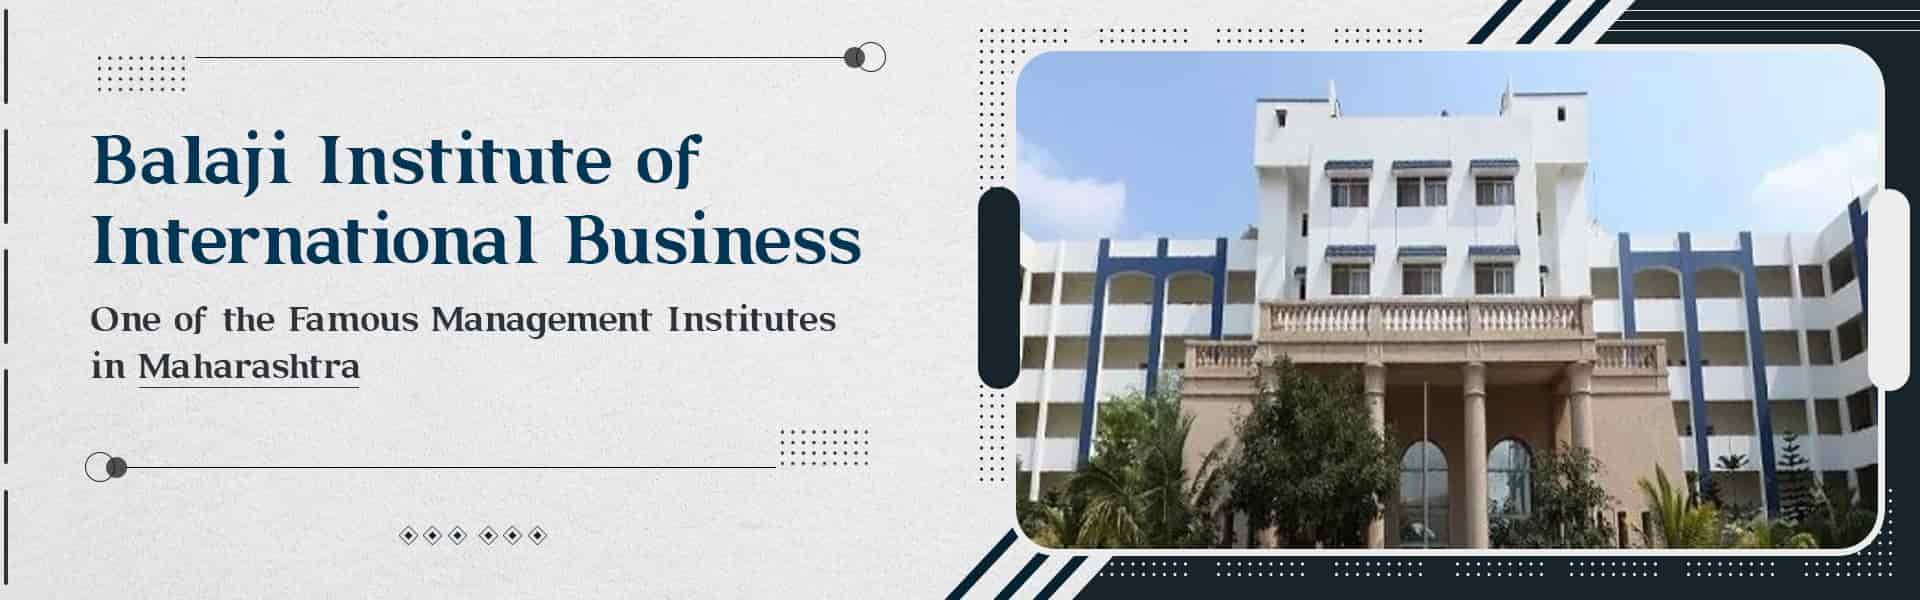 Balaji Institute of International Business (BIIB Pune)